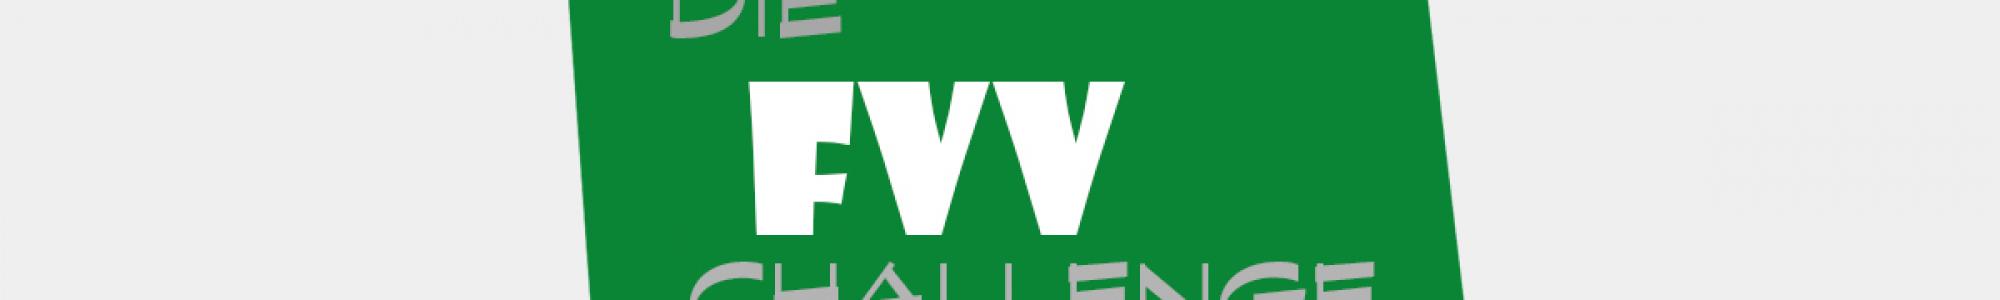 FVV Challenge_Quiz